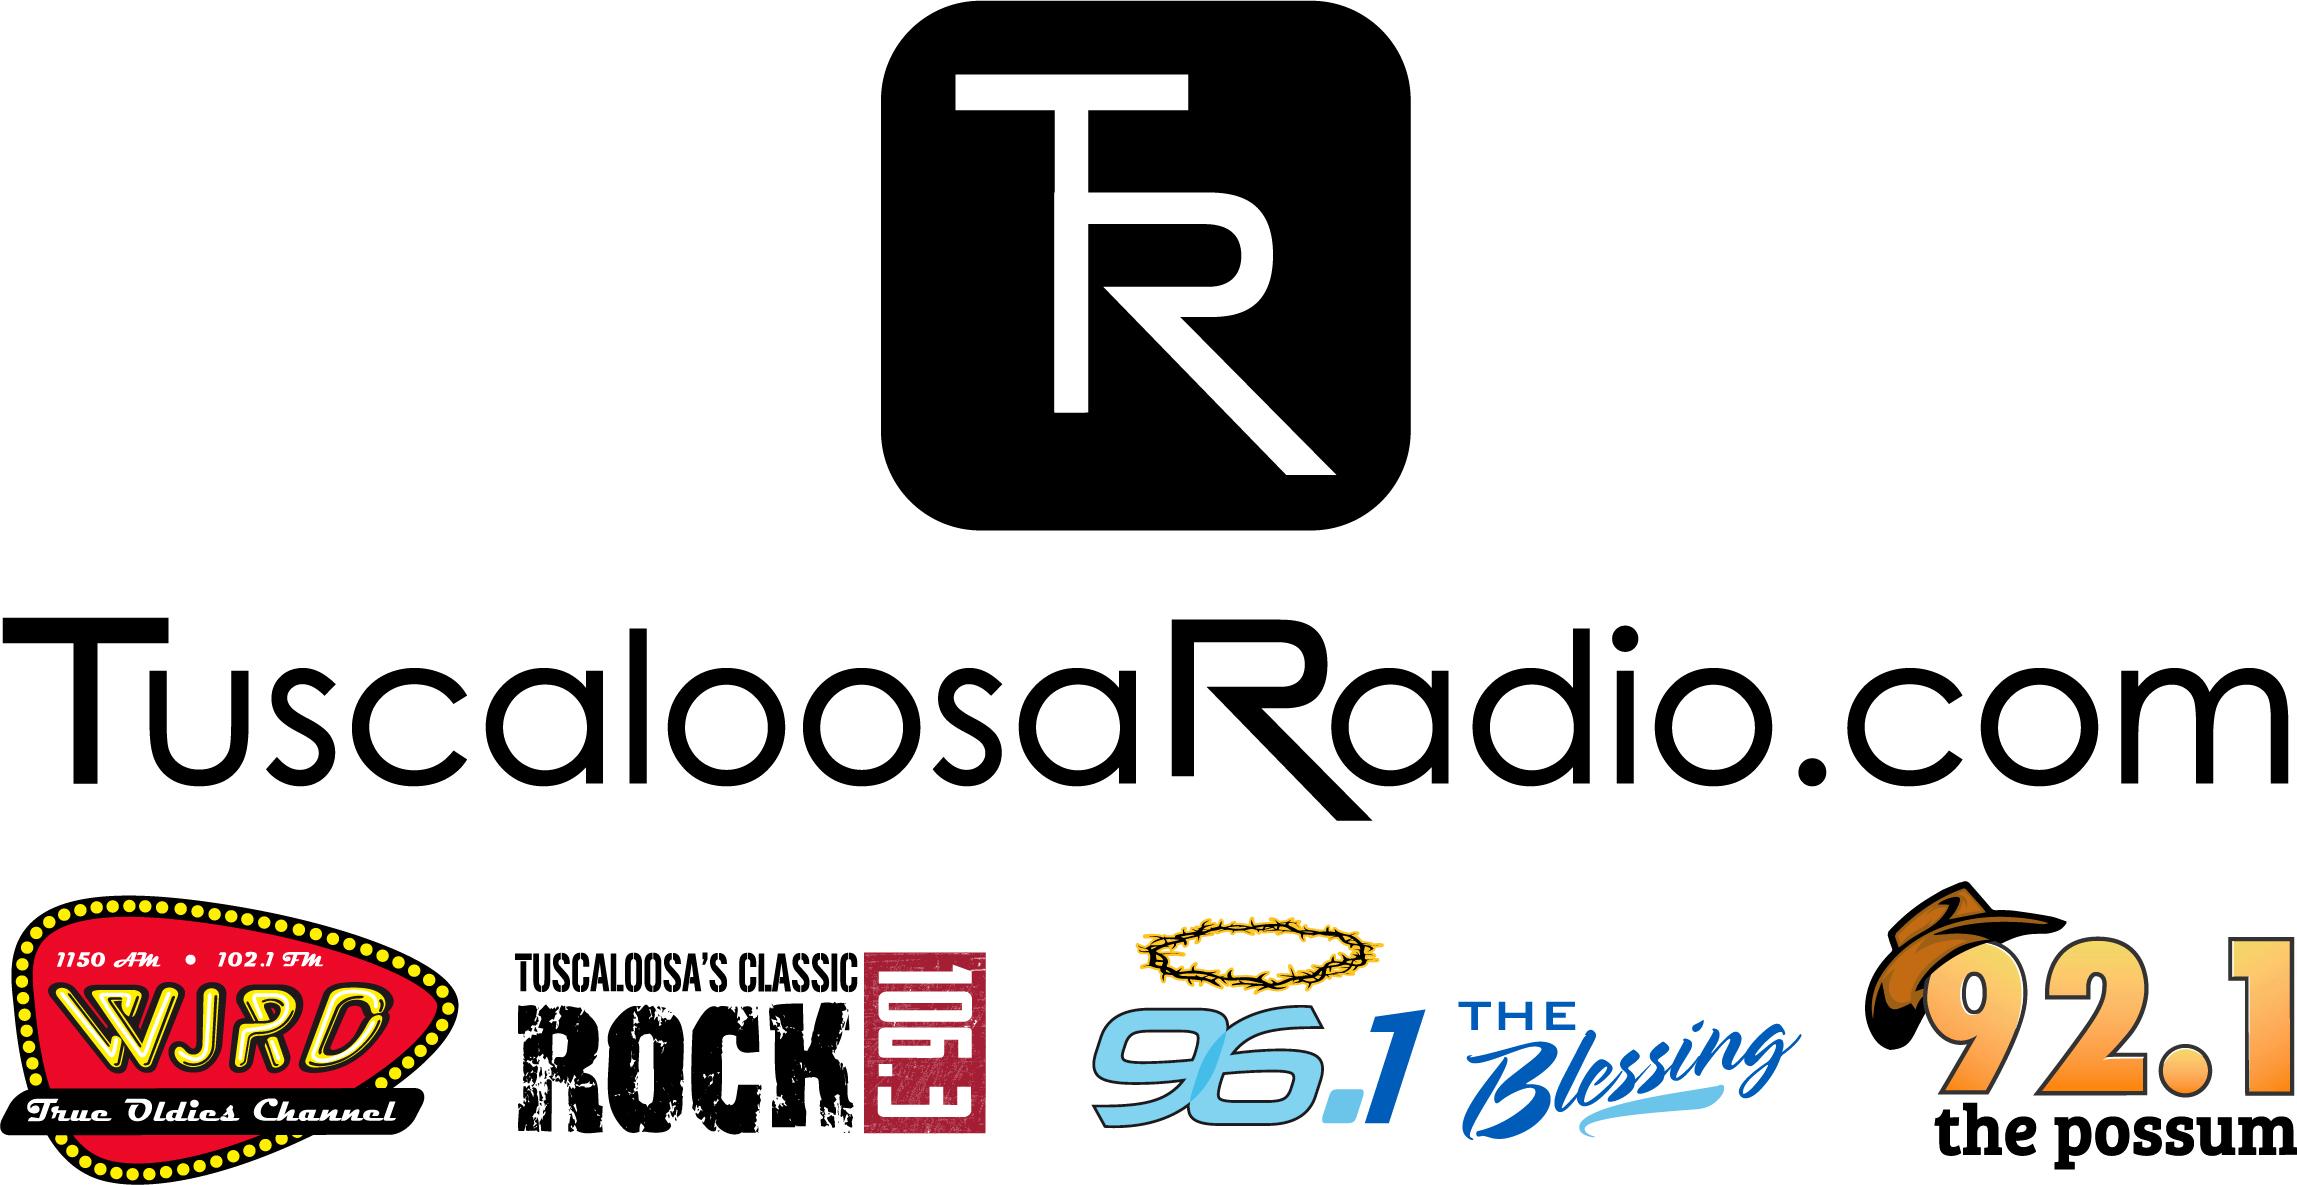 Tuscaloosa Radio